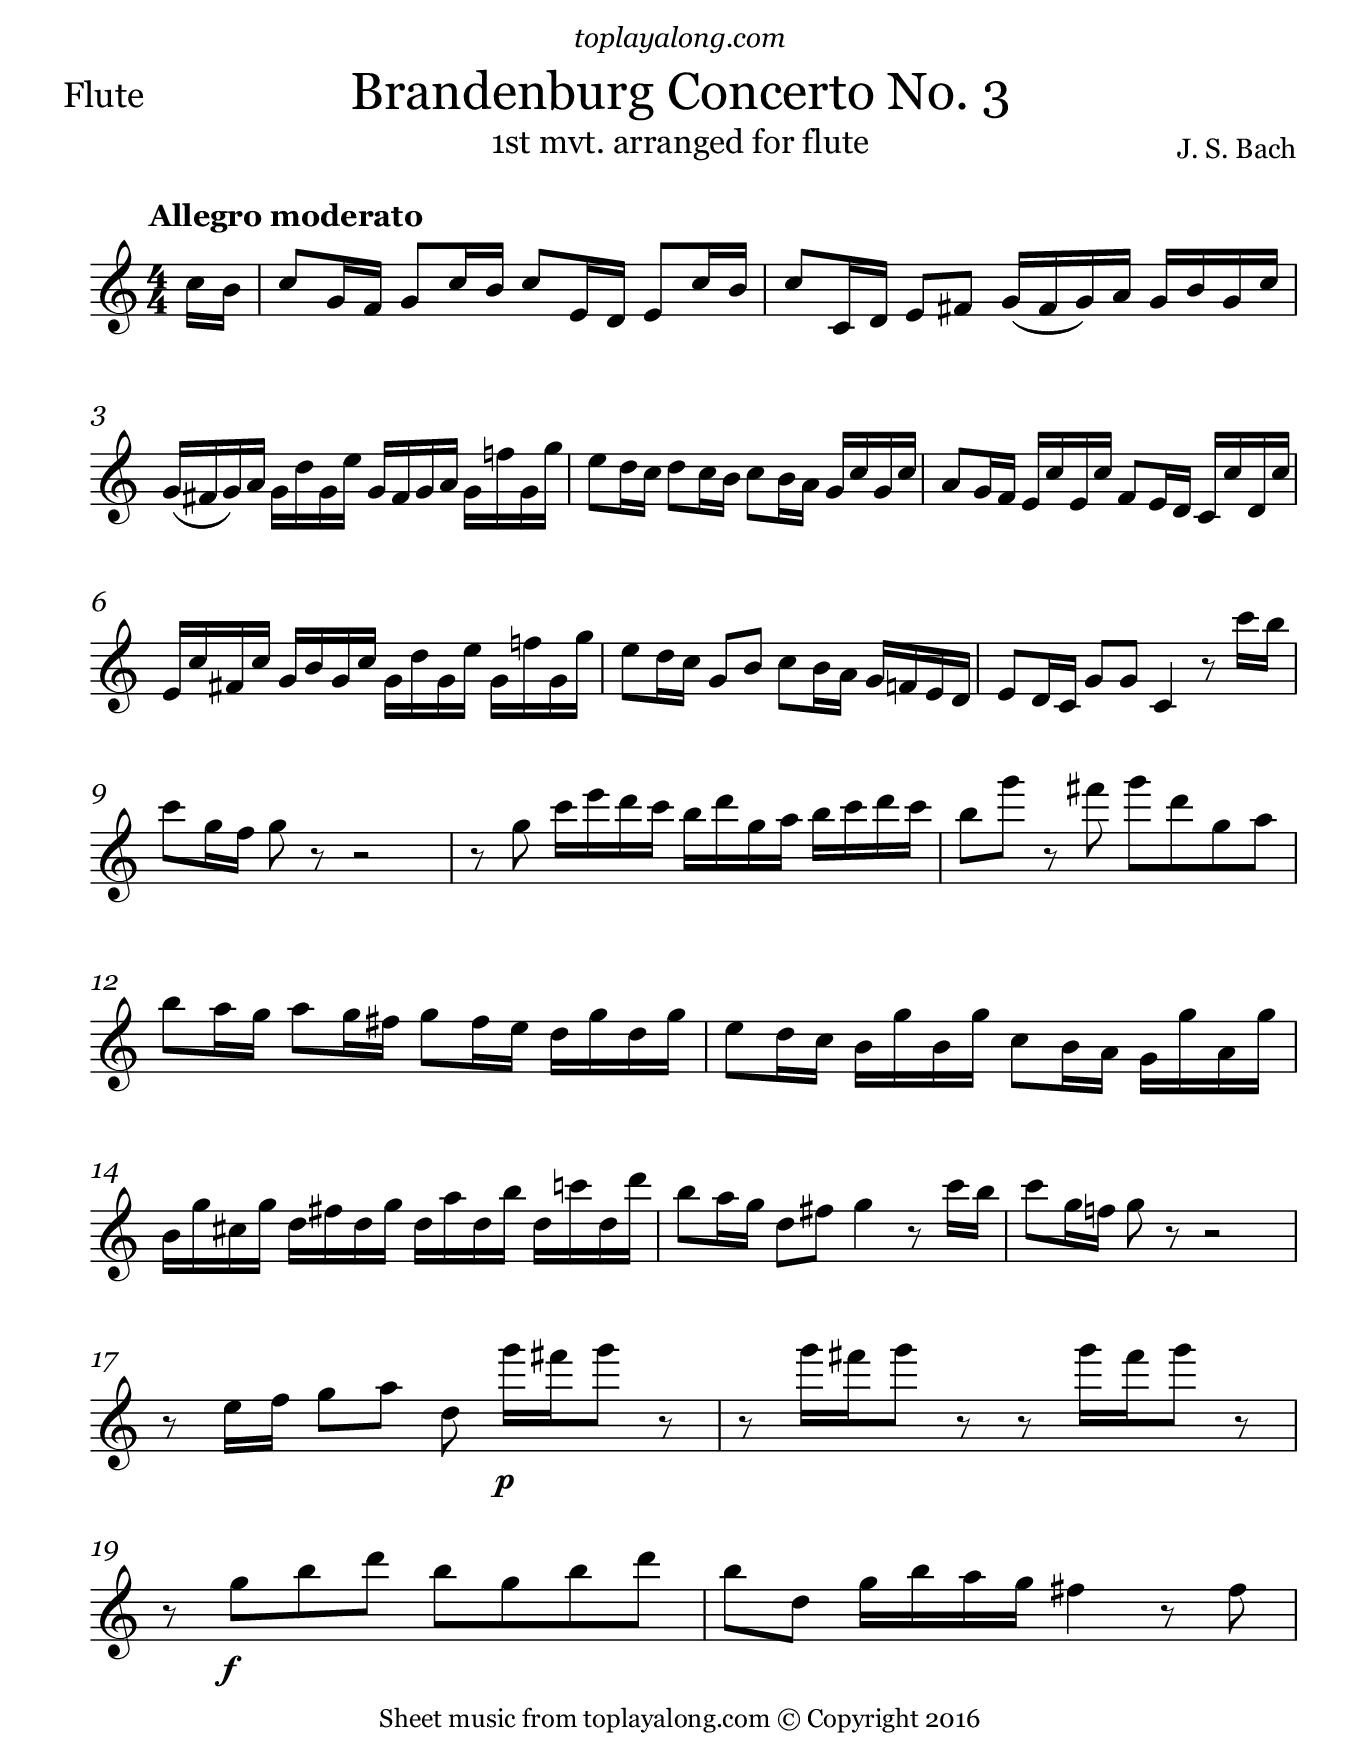 Brandenburg Concerto No. 3 (mvt. 1) by J. S. Bach. Sheet music for Flute, page 1.